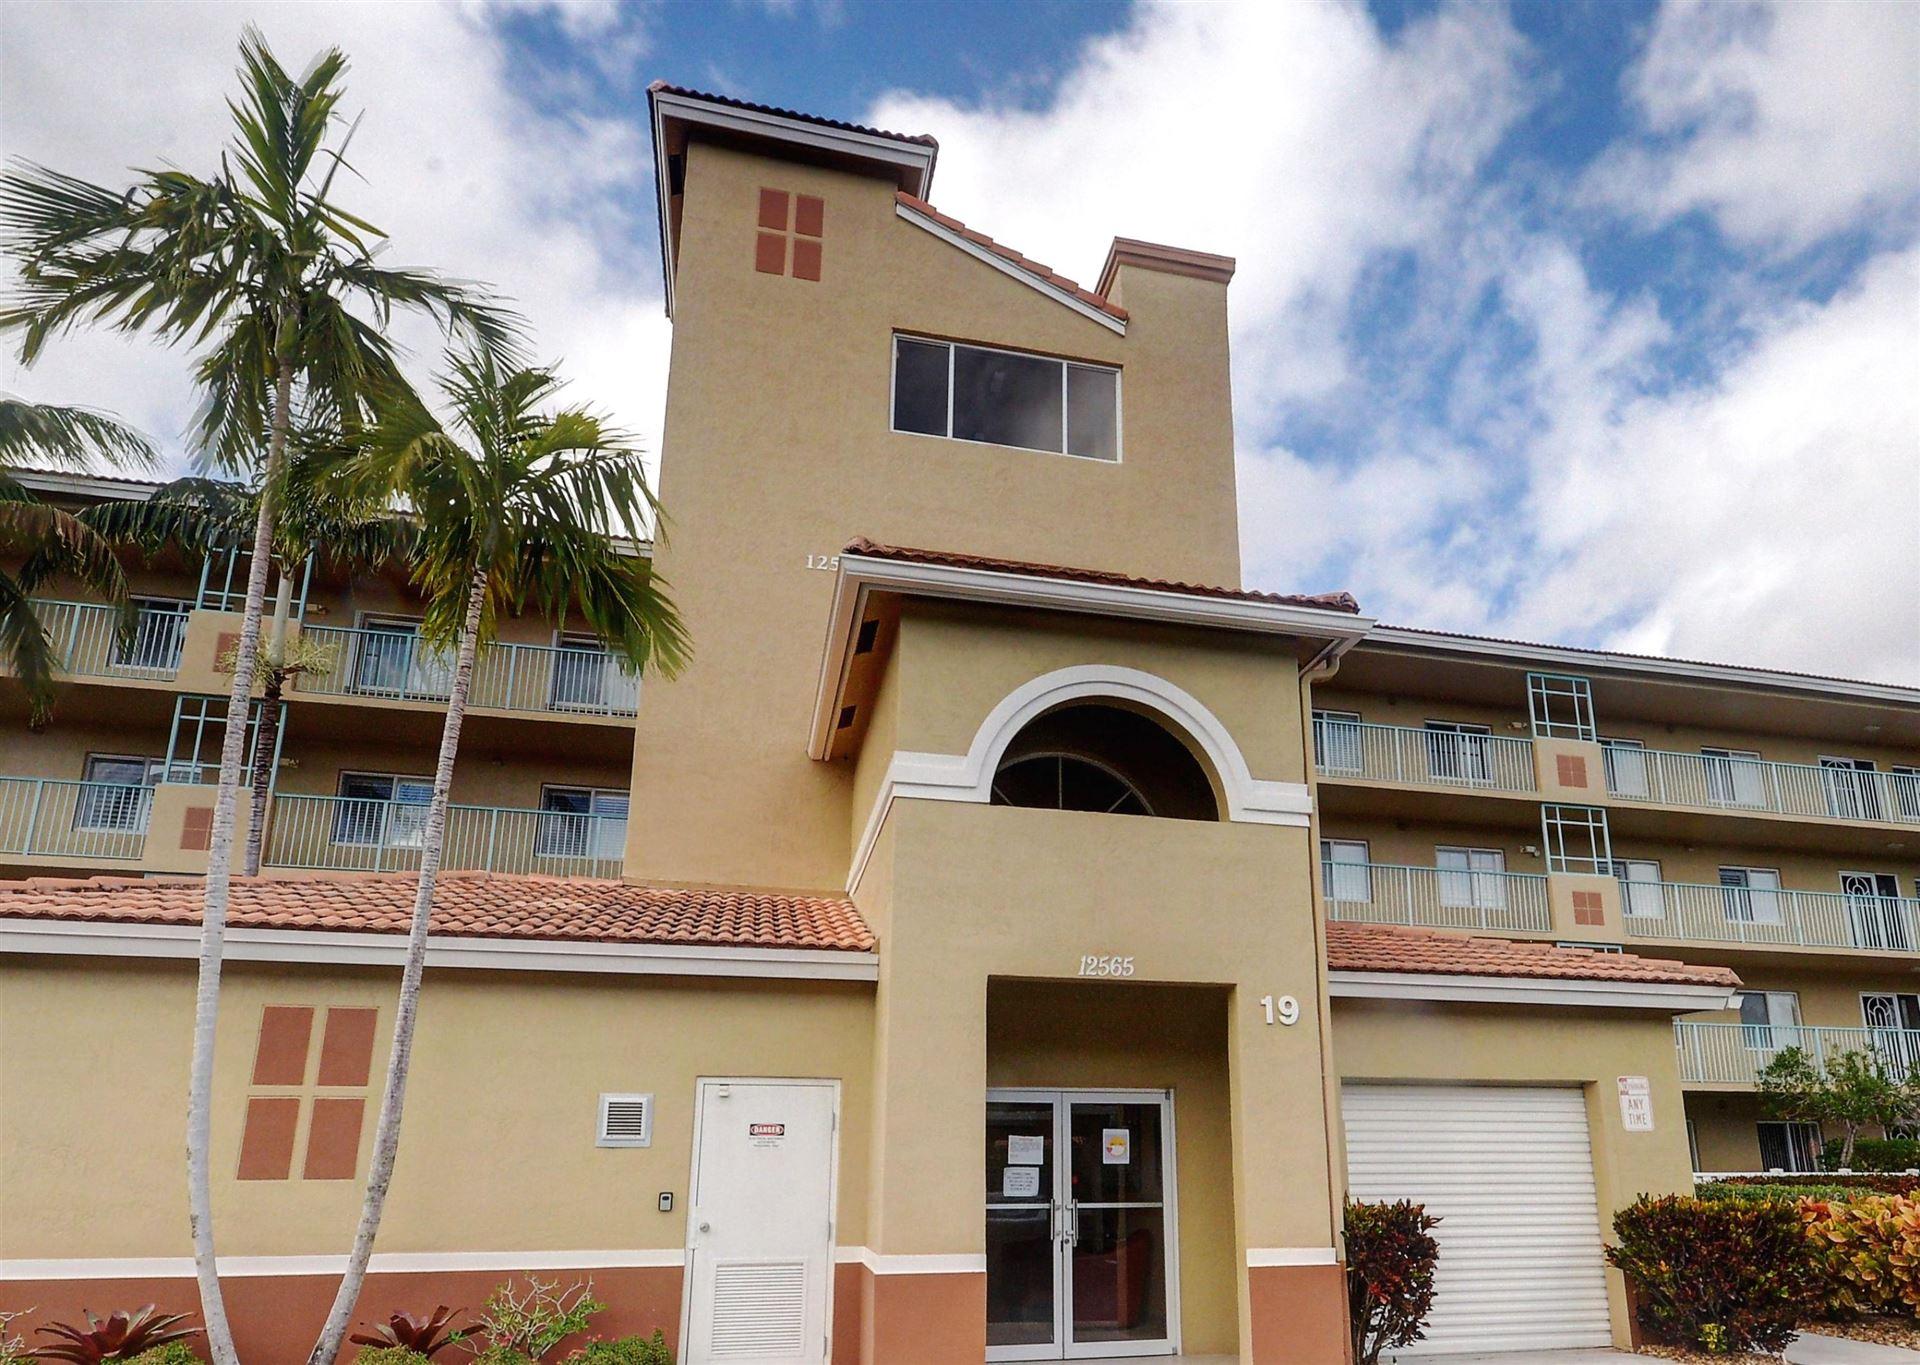 12565 Imperial Isle Drive #303, Boynton Beach, FL 33437 - #: RX-10611257